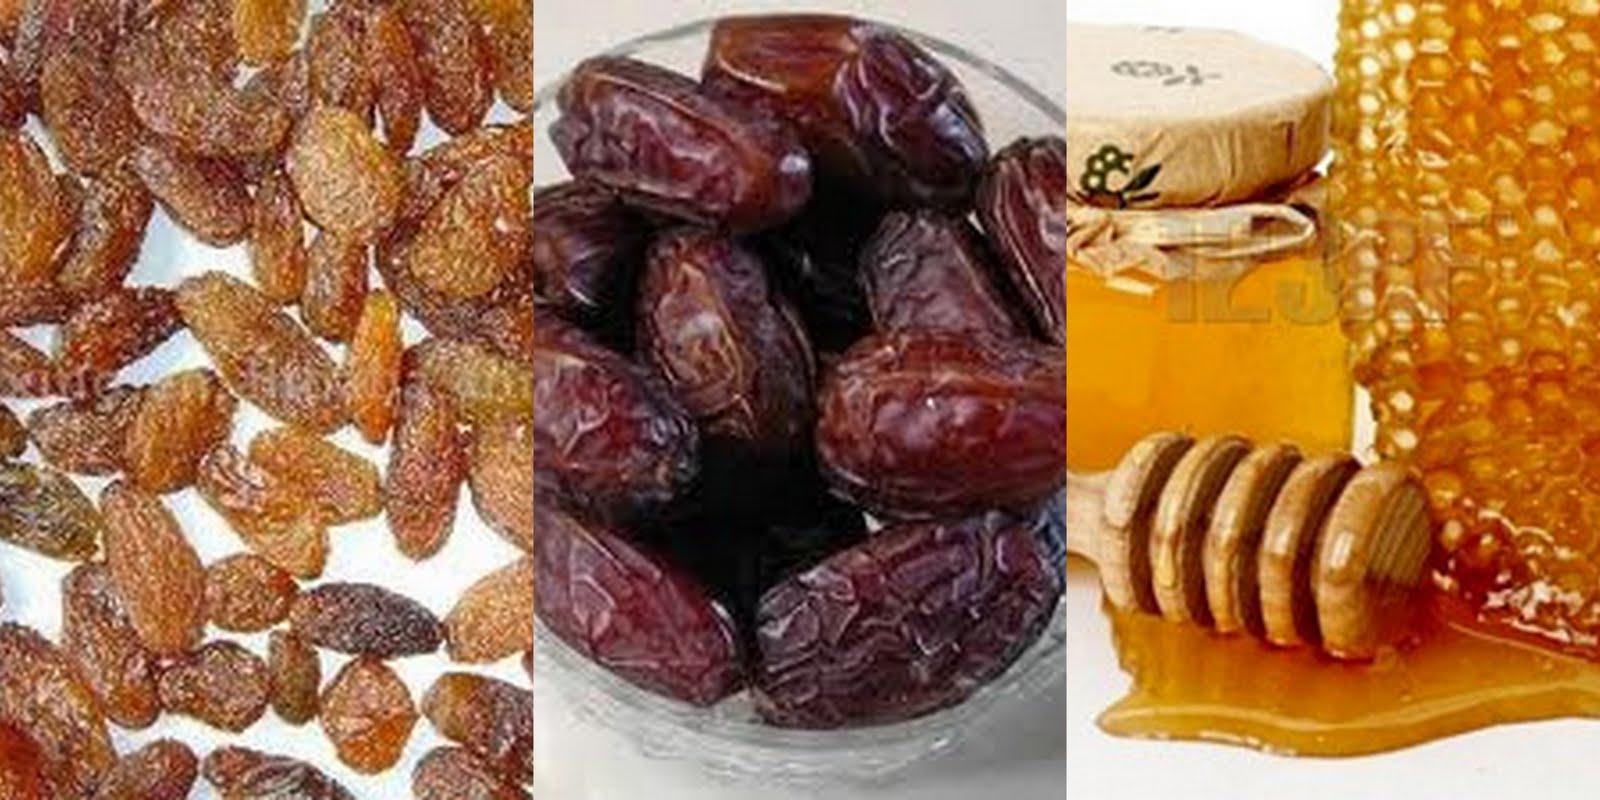 my life me makanan sunnah nabi muhammad saw kurma